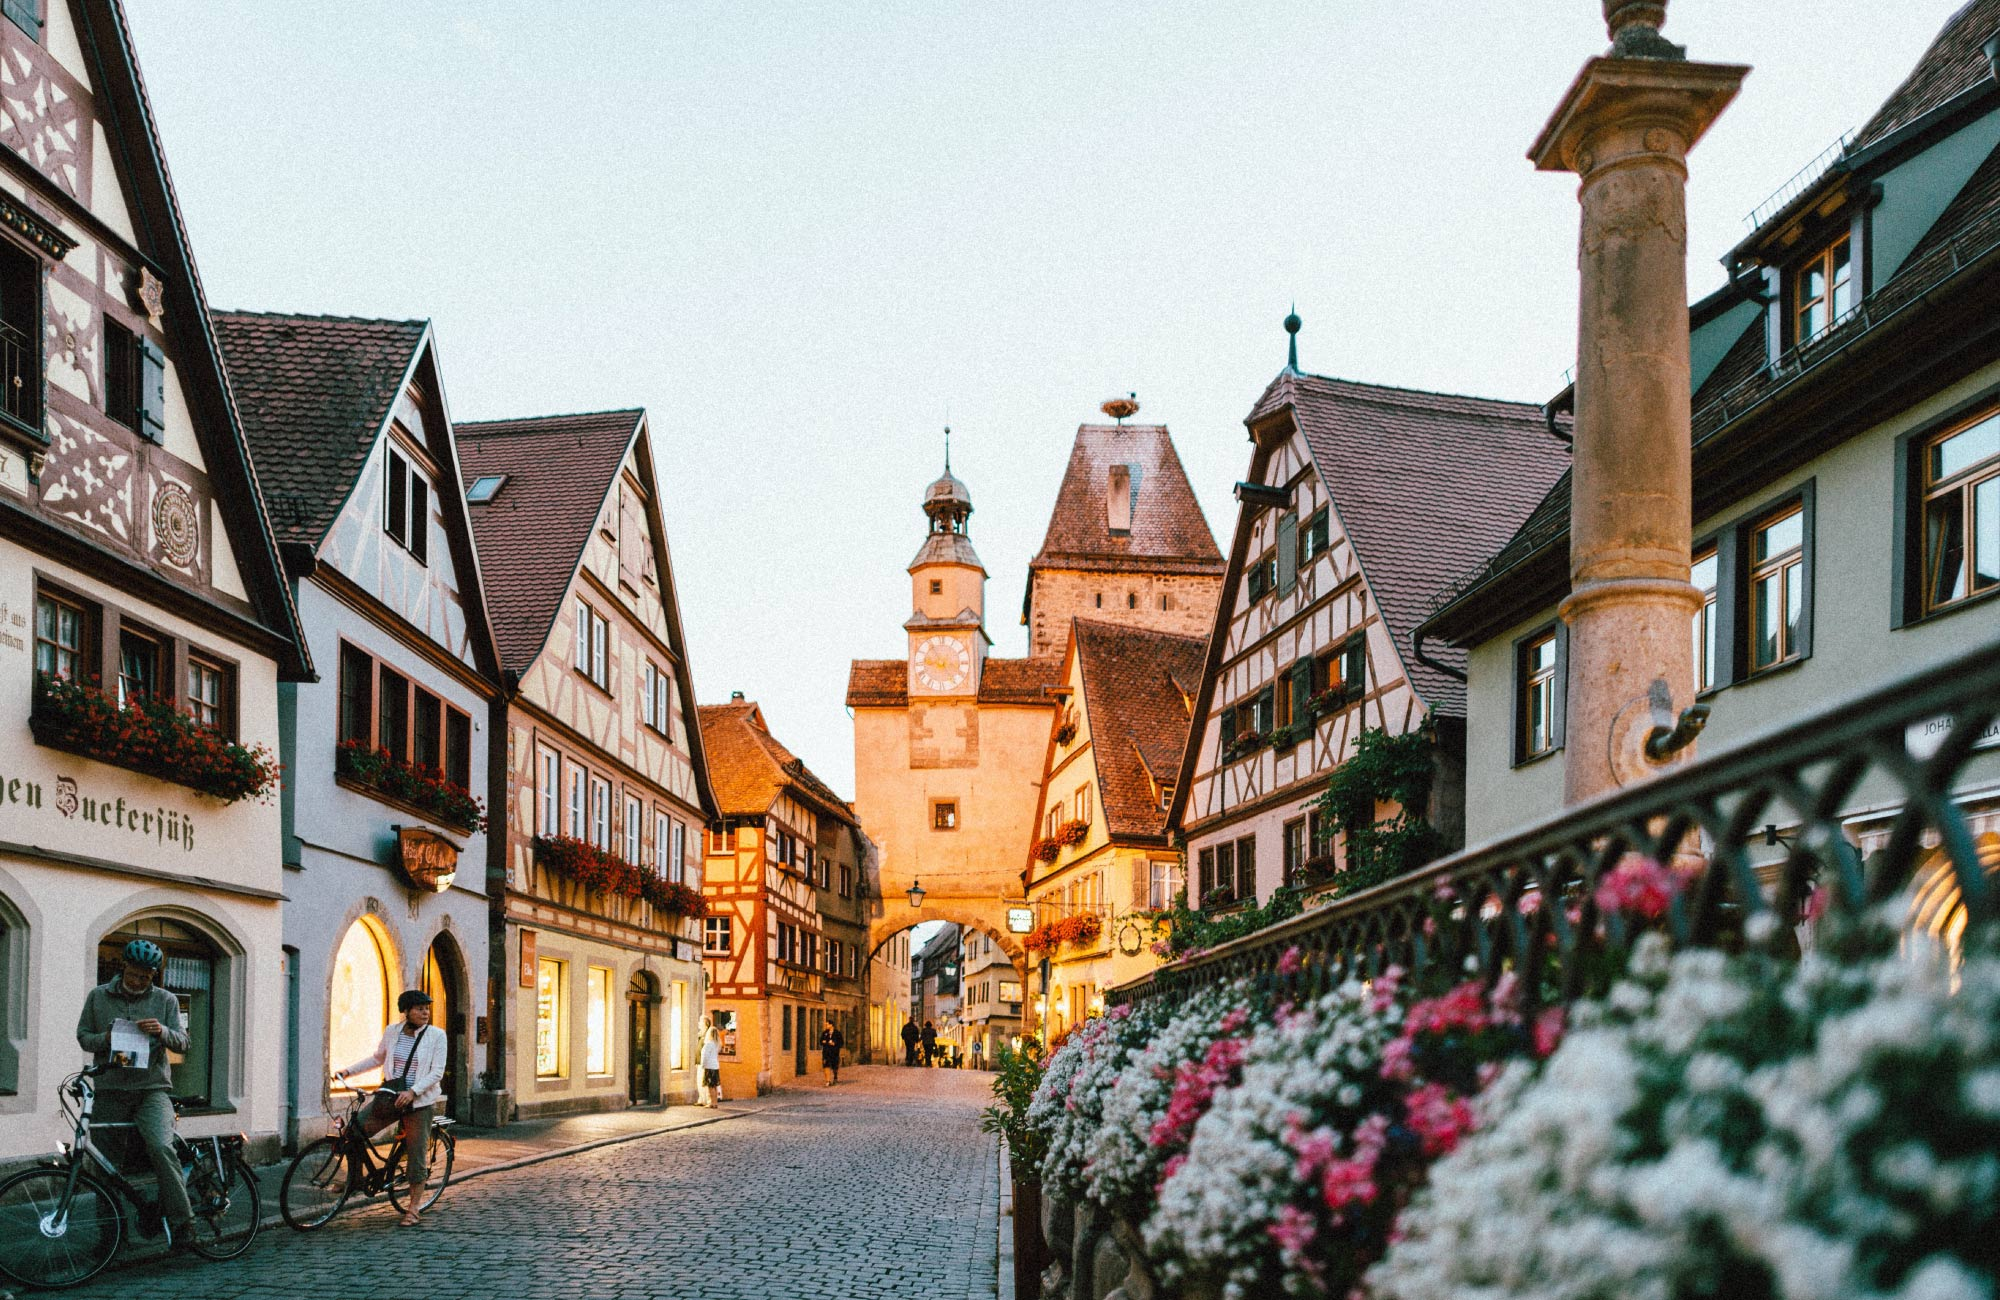 A pretty street in Rothenburg ob der Tauber in Germany